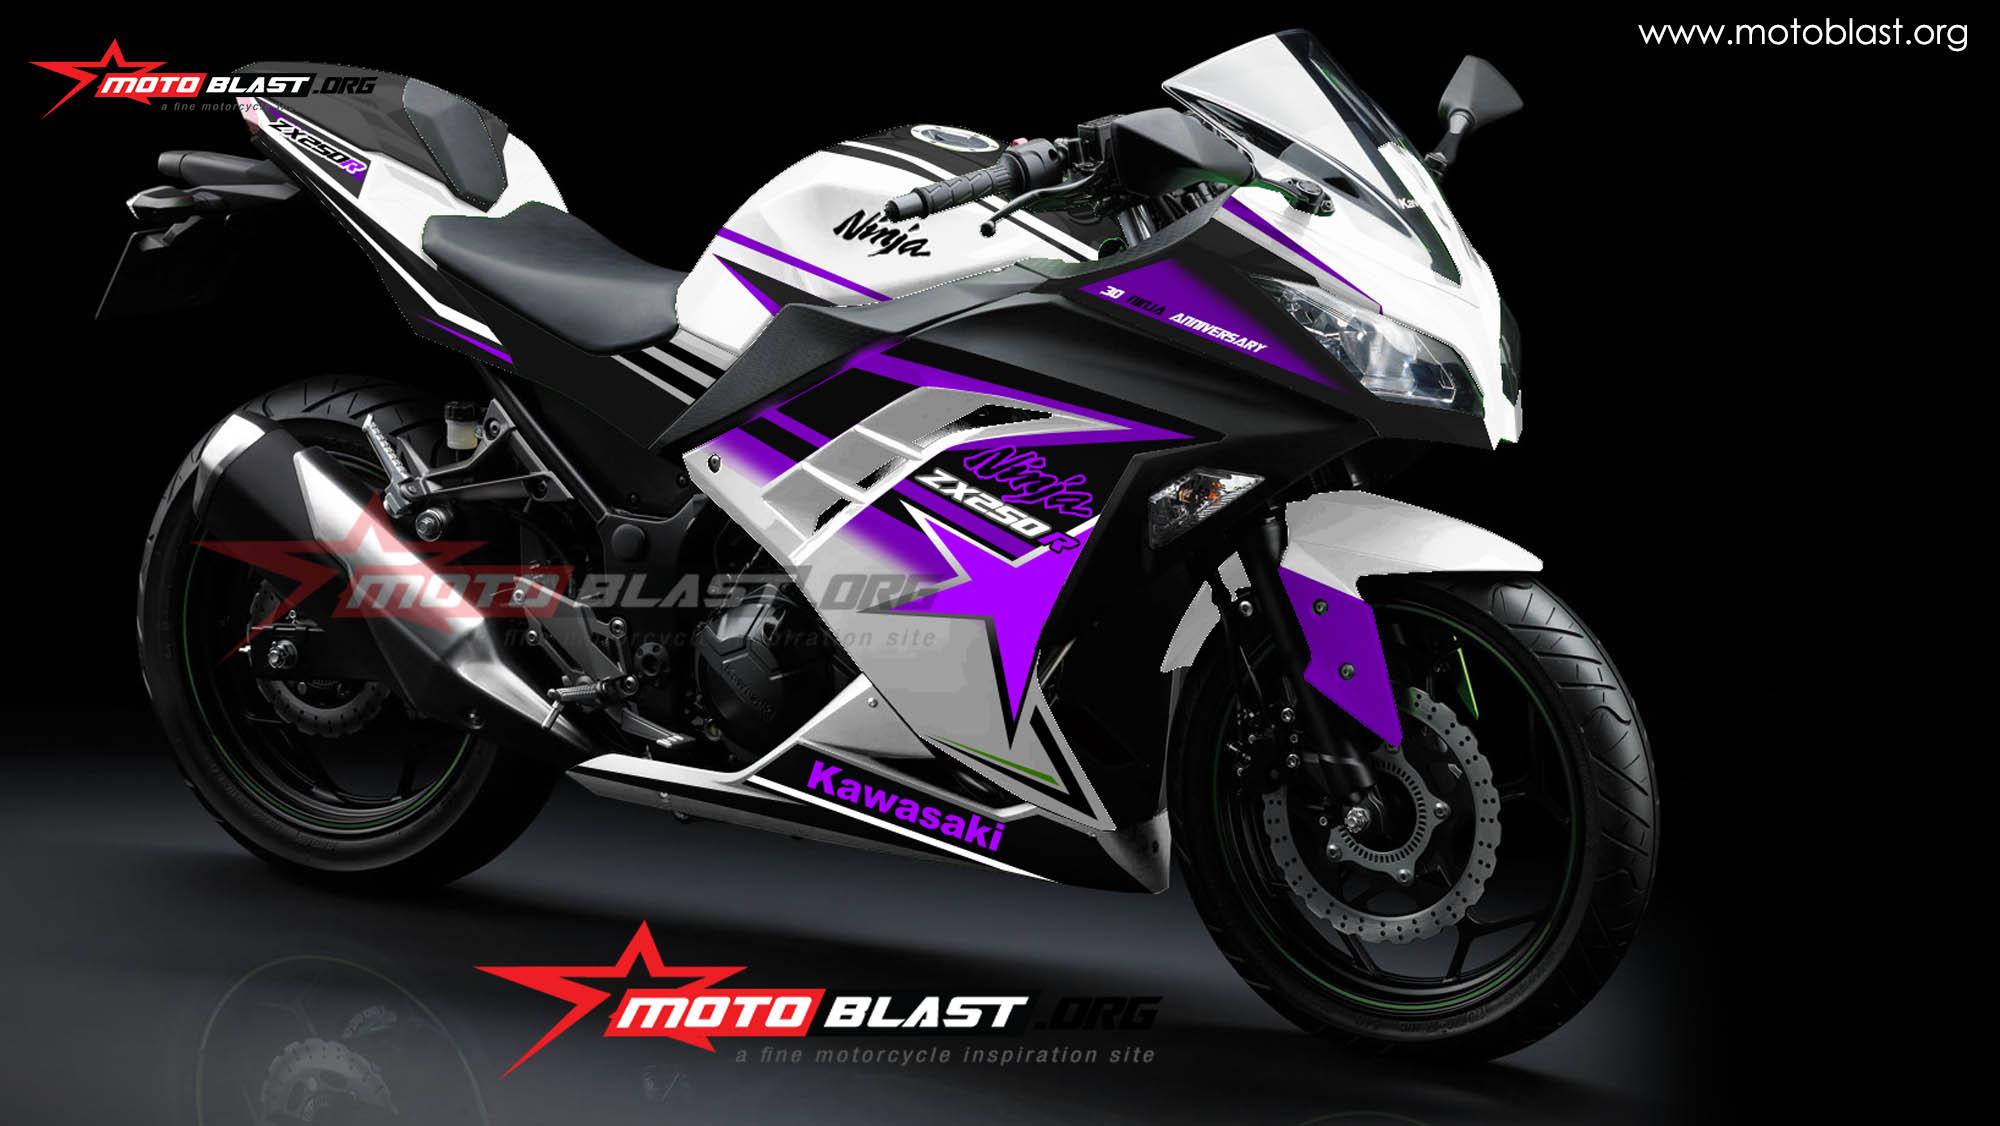 Ninja 250r fi white purple jpg